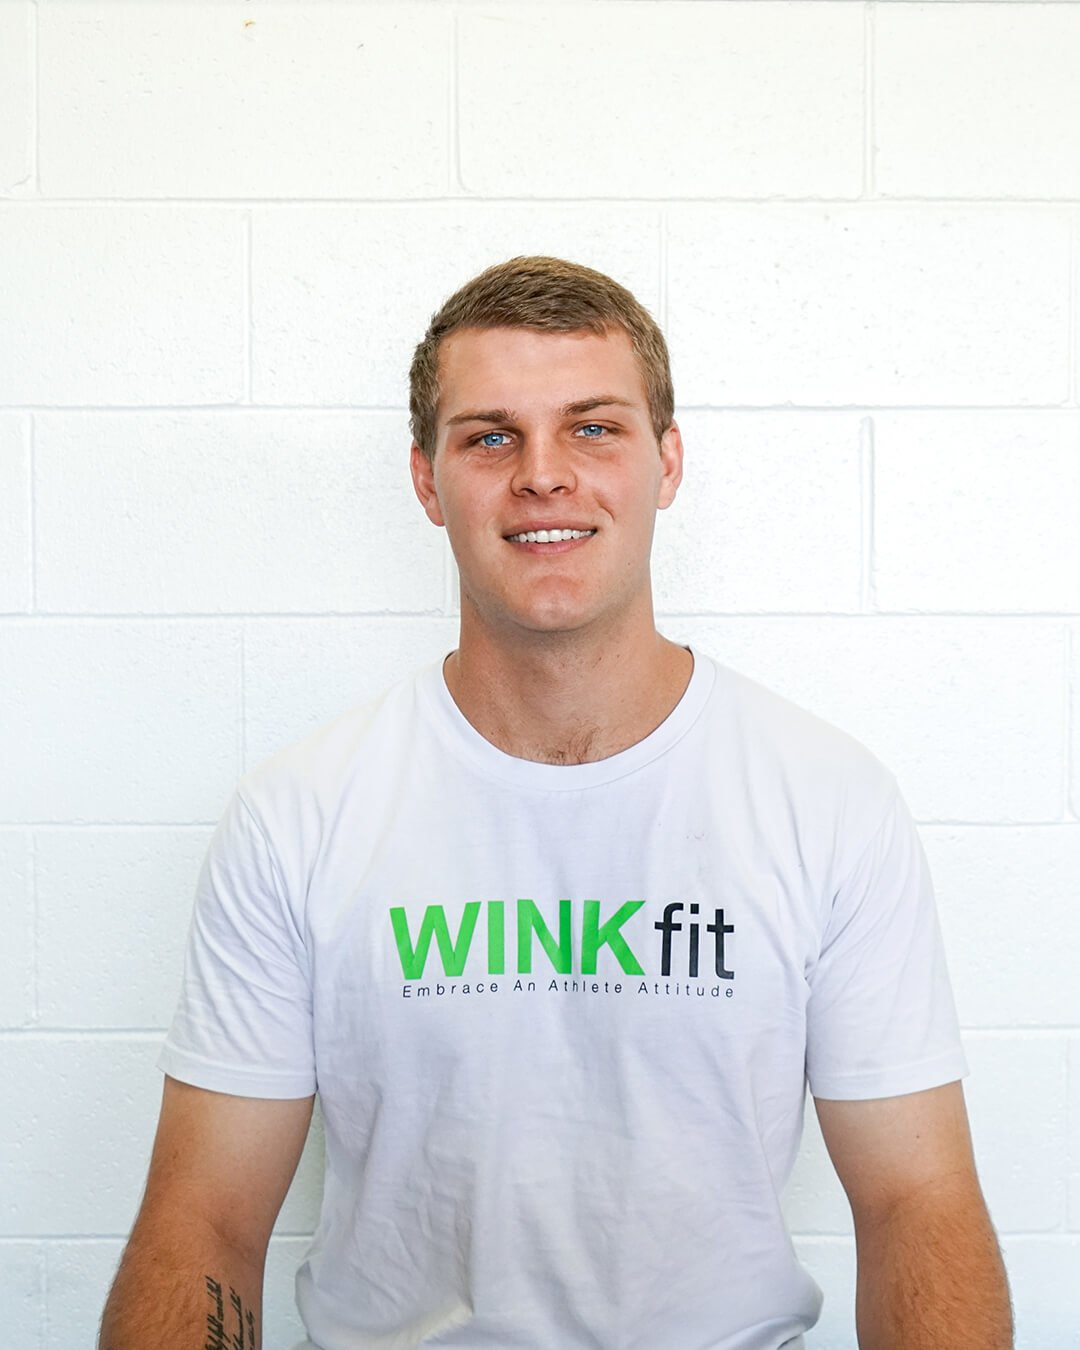 nick maudsly in winkfit shirt